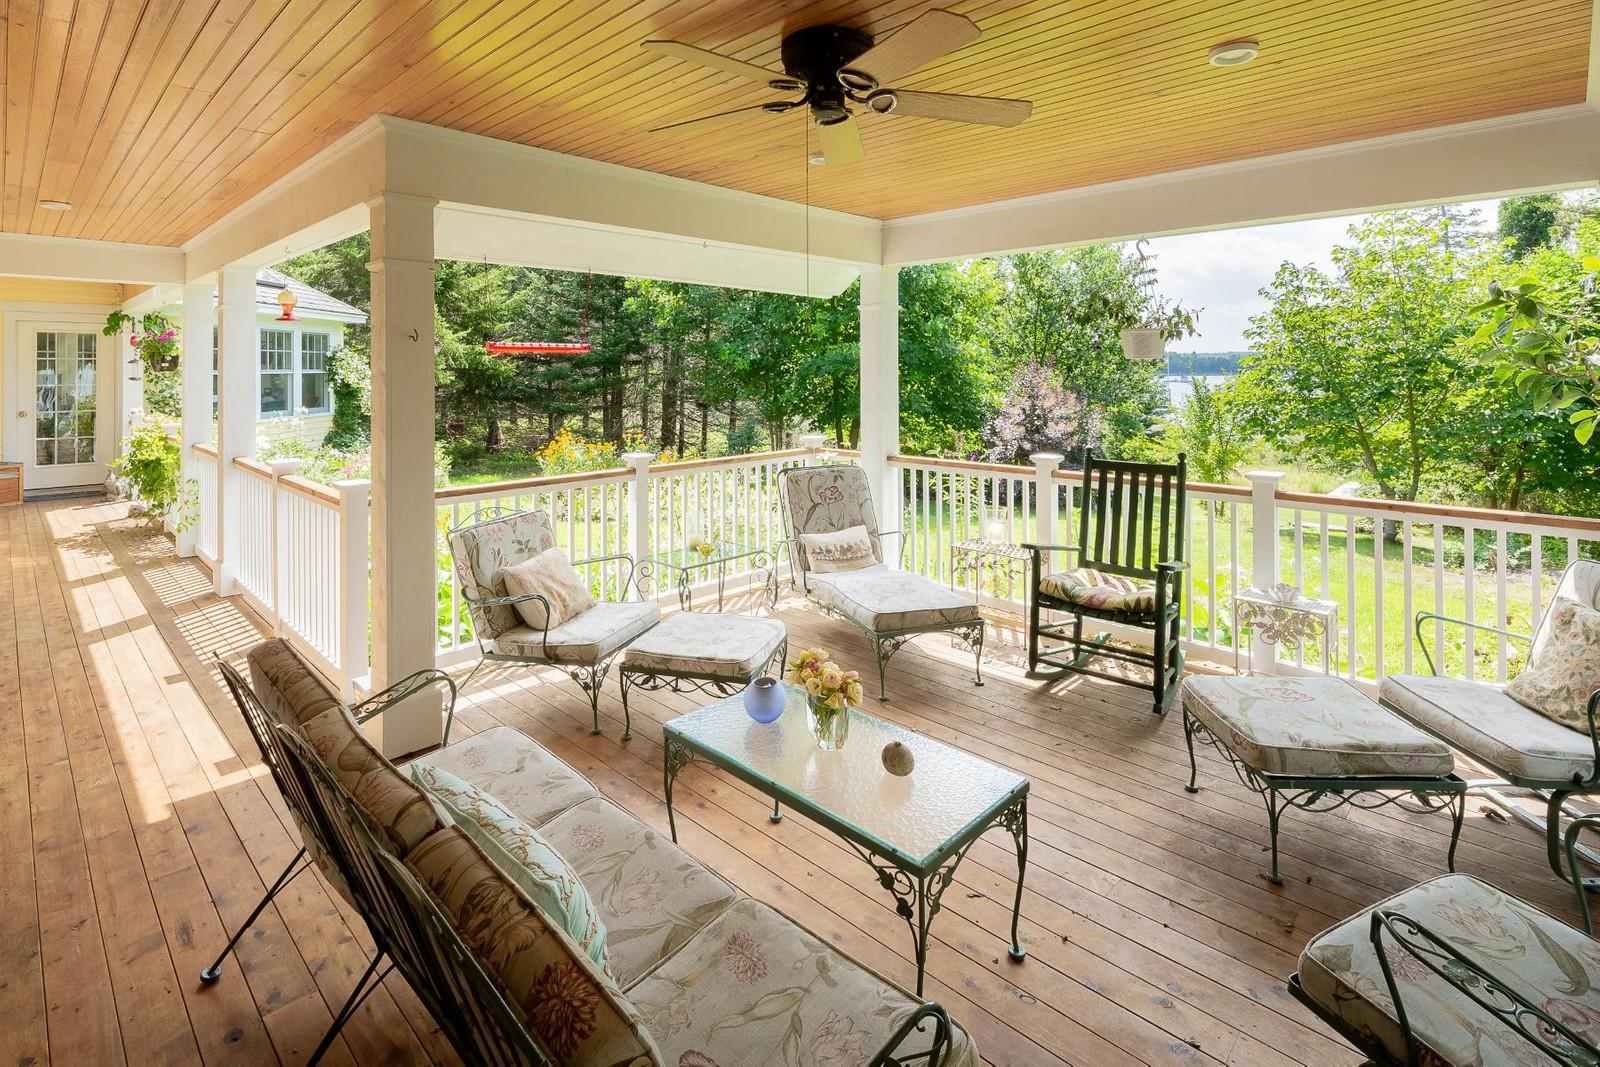 Single Family Homes for Sale at 134 Big Tree Lane Islesboro, Maine 04848 United States